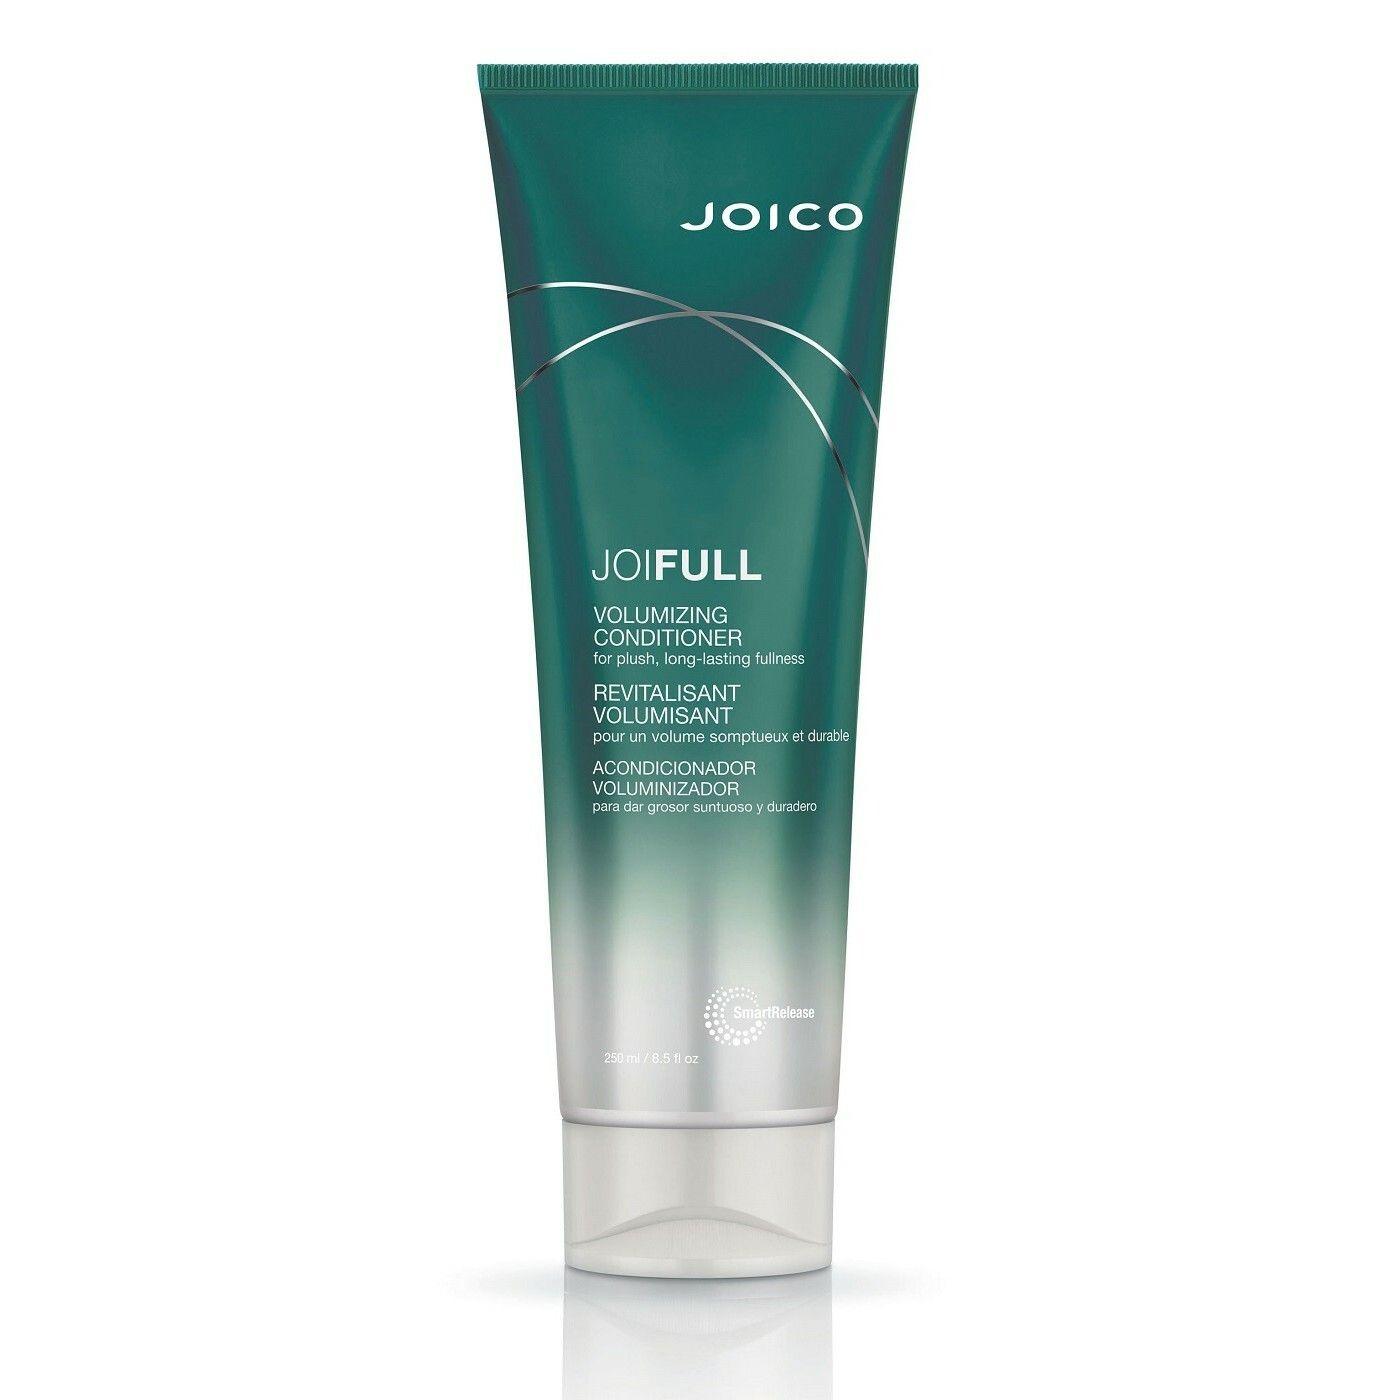 Joico Joifull Volumizing Conditioner - 250ml